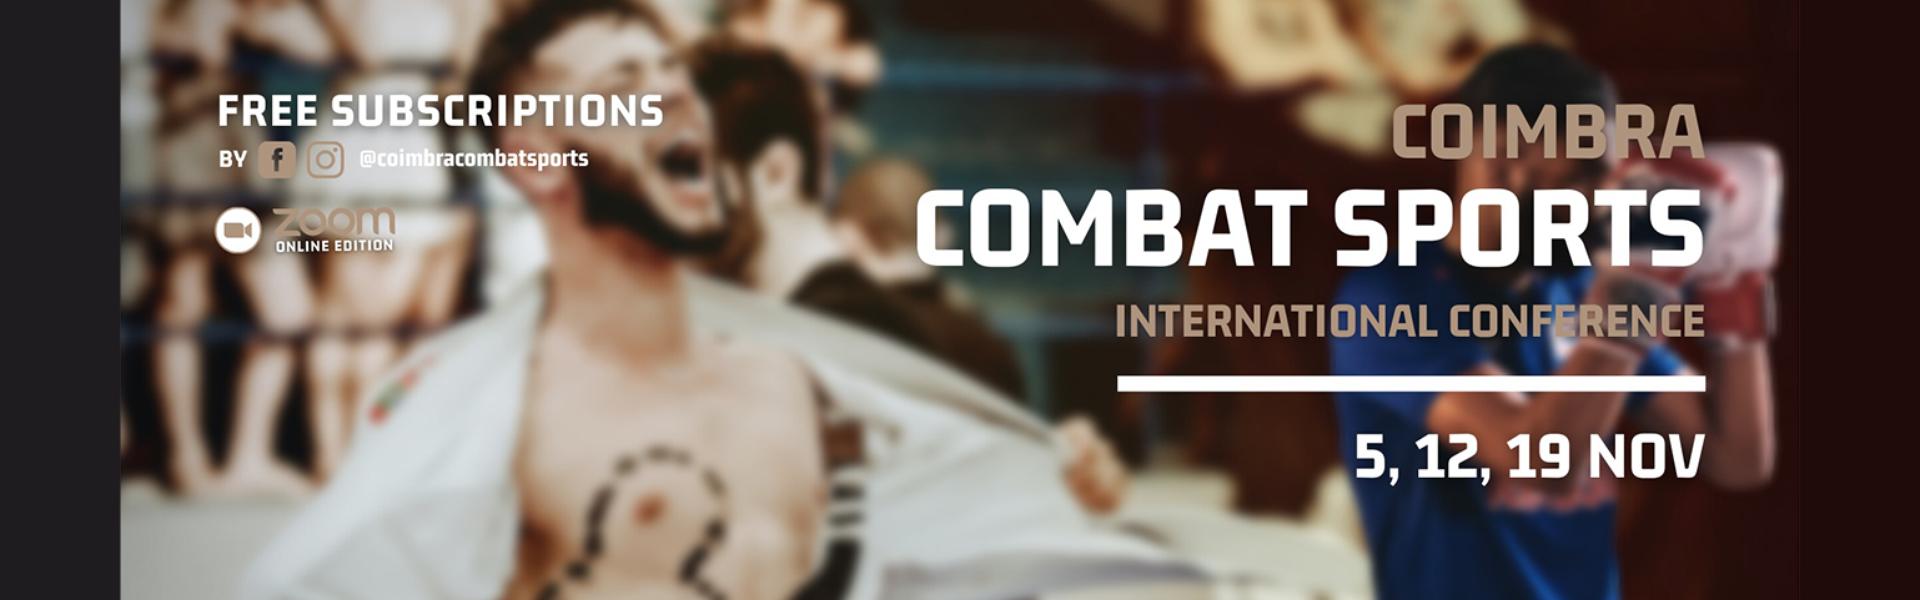 Coimbra Combat Sports International Conference